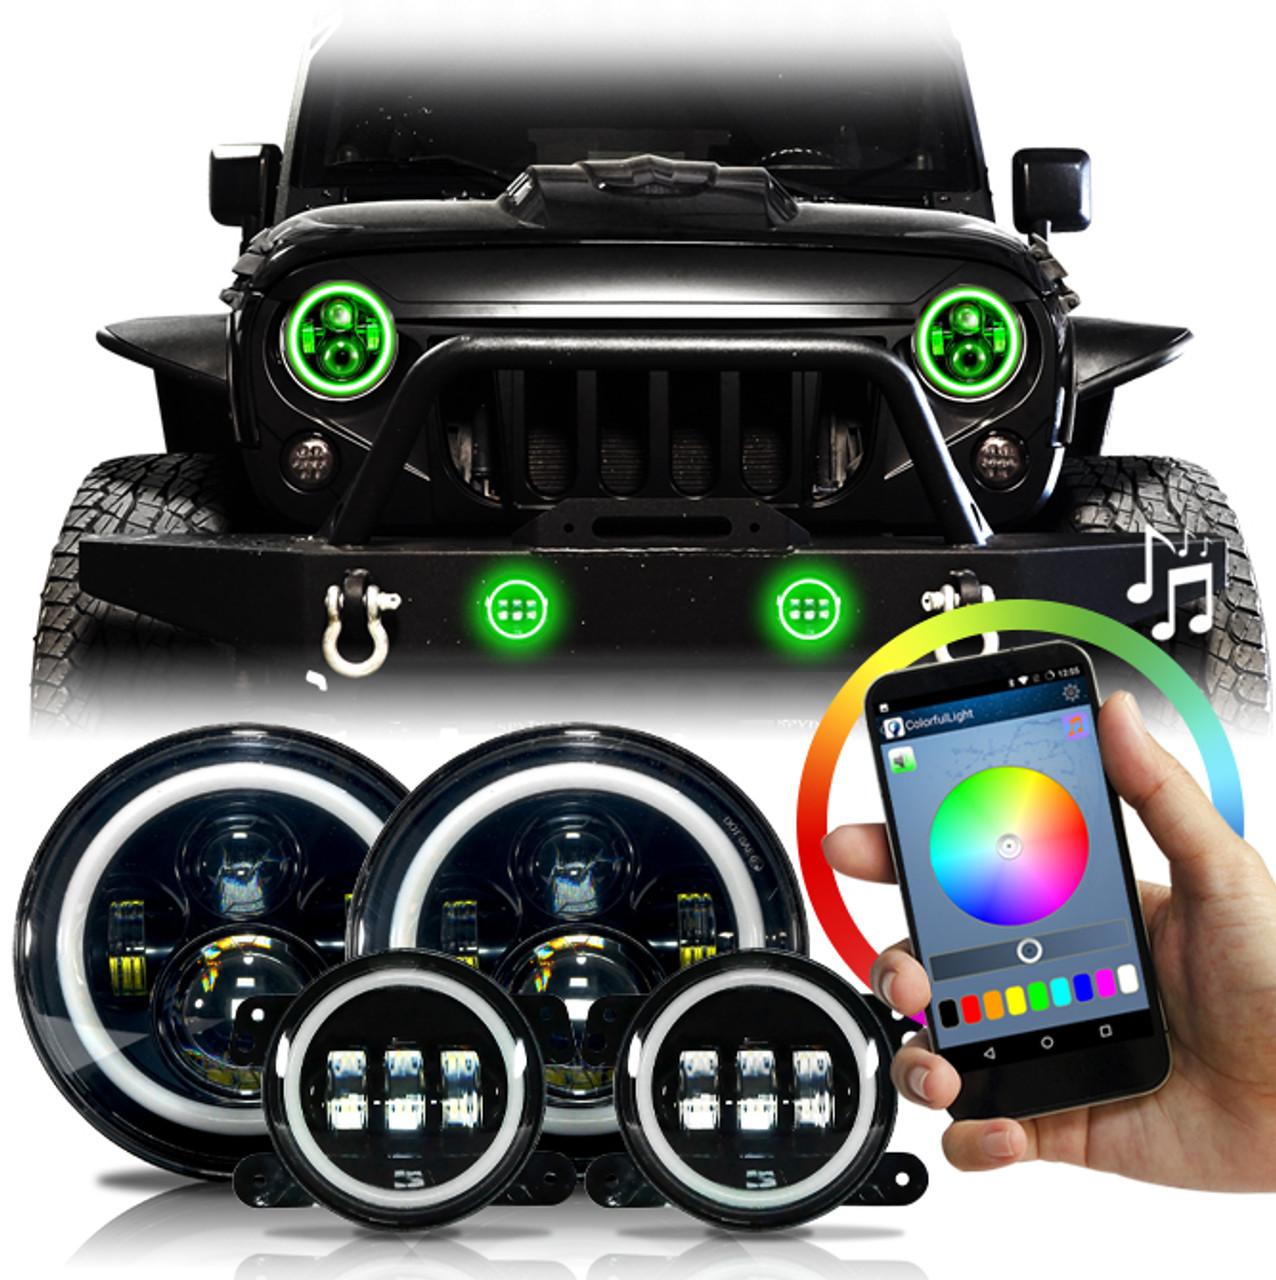 HALO RGB Color Projector LED Headlights & Fog Lights Kit for Wrangler Halo Projector Fog Light Wiring Diagram on